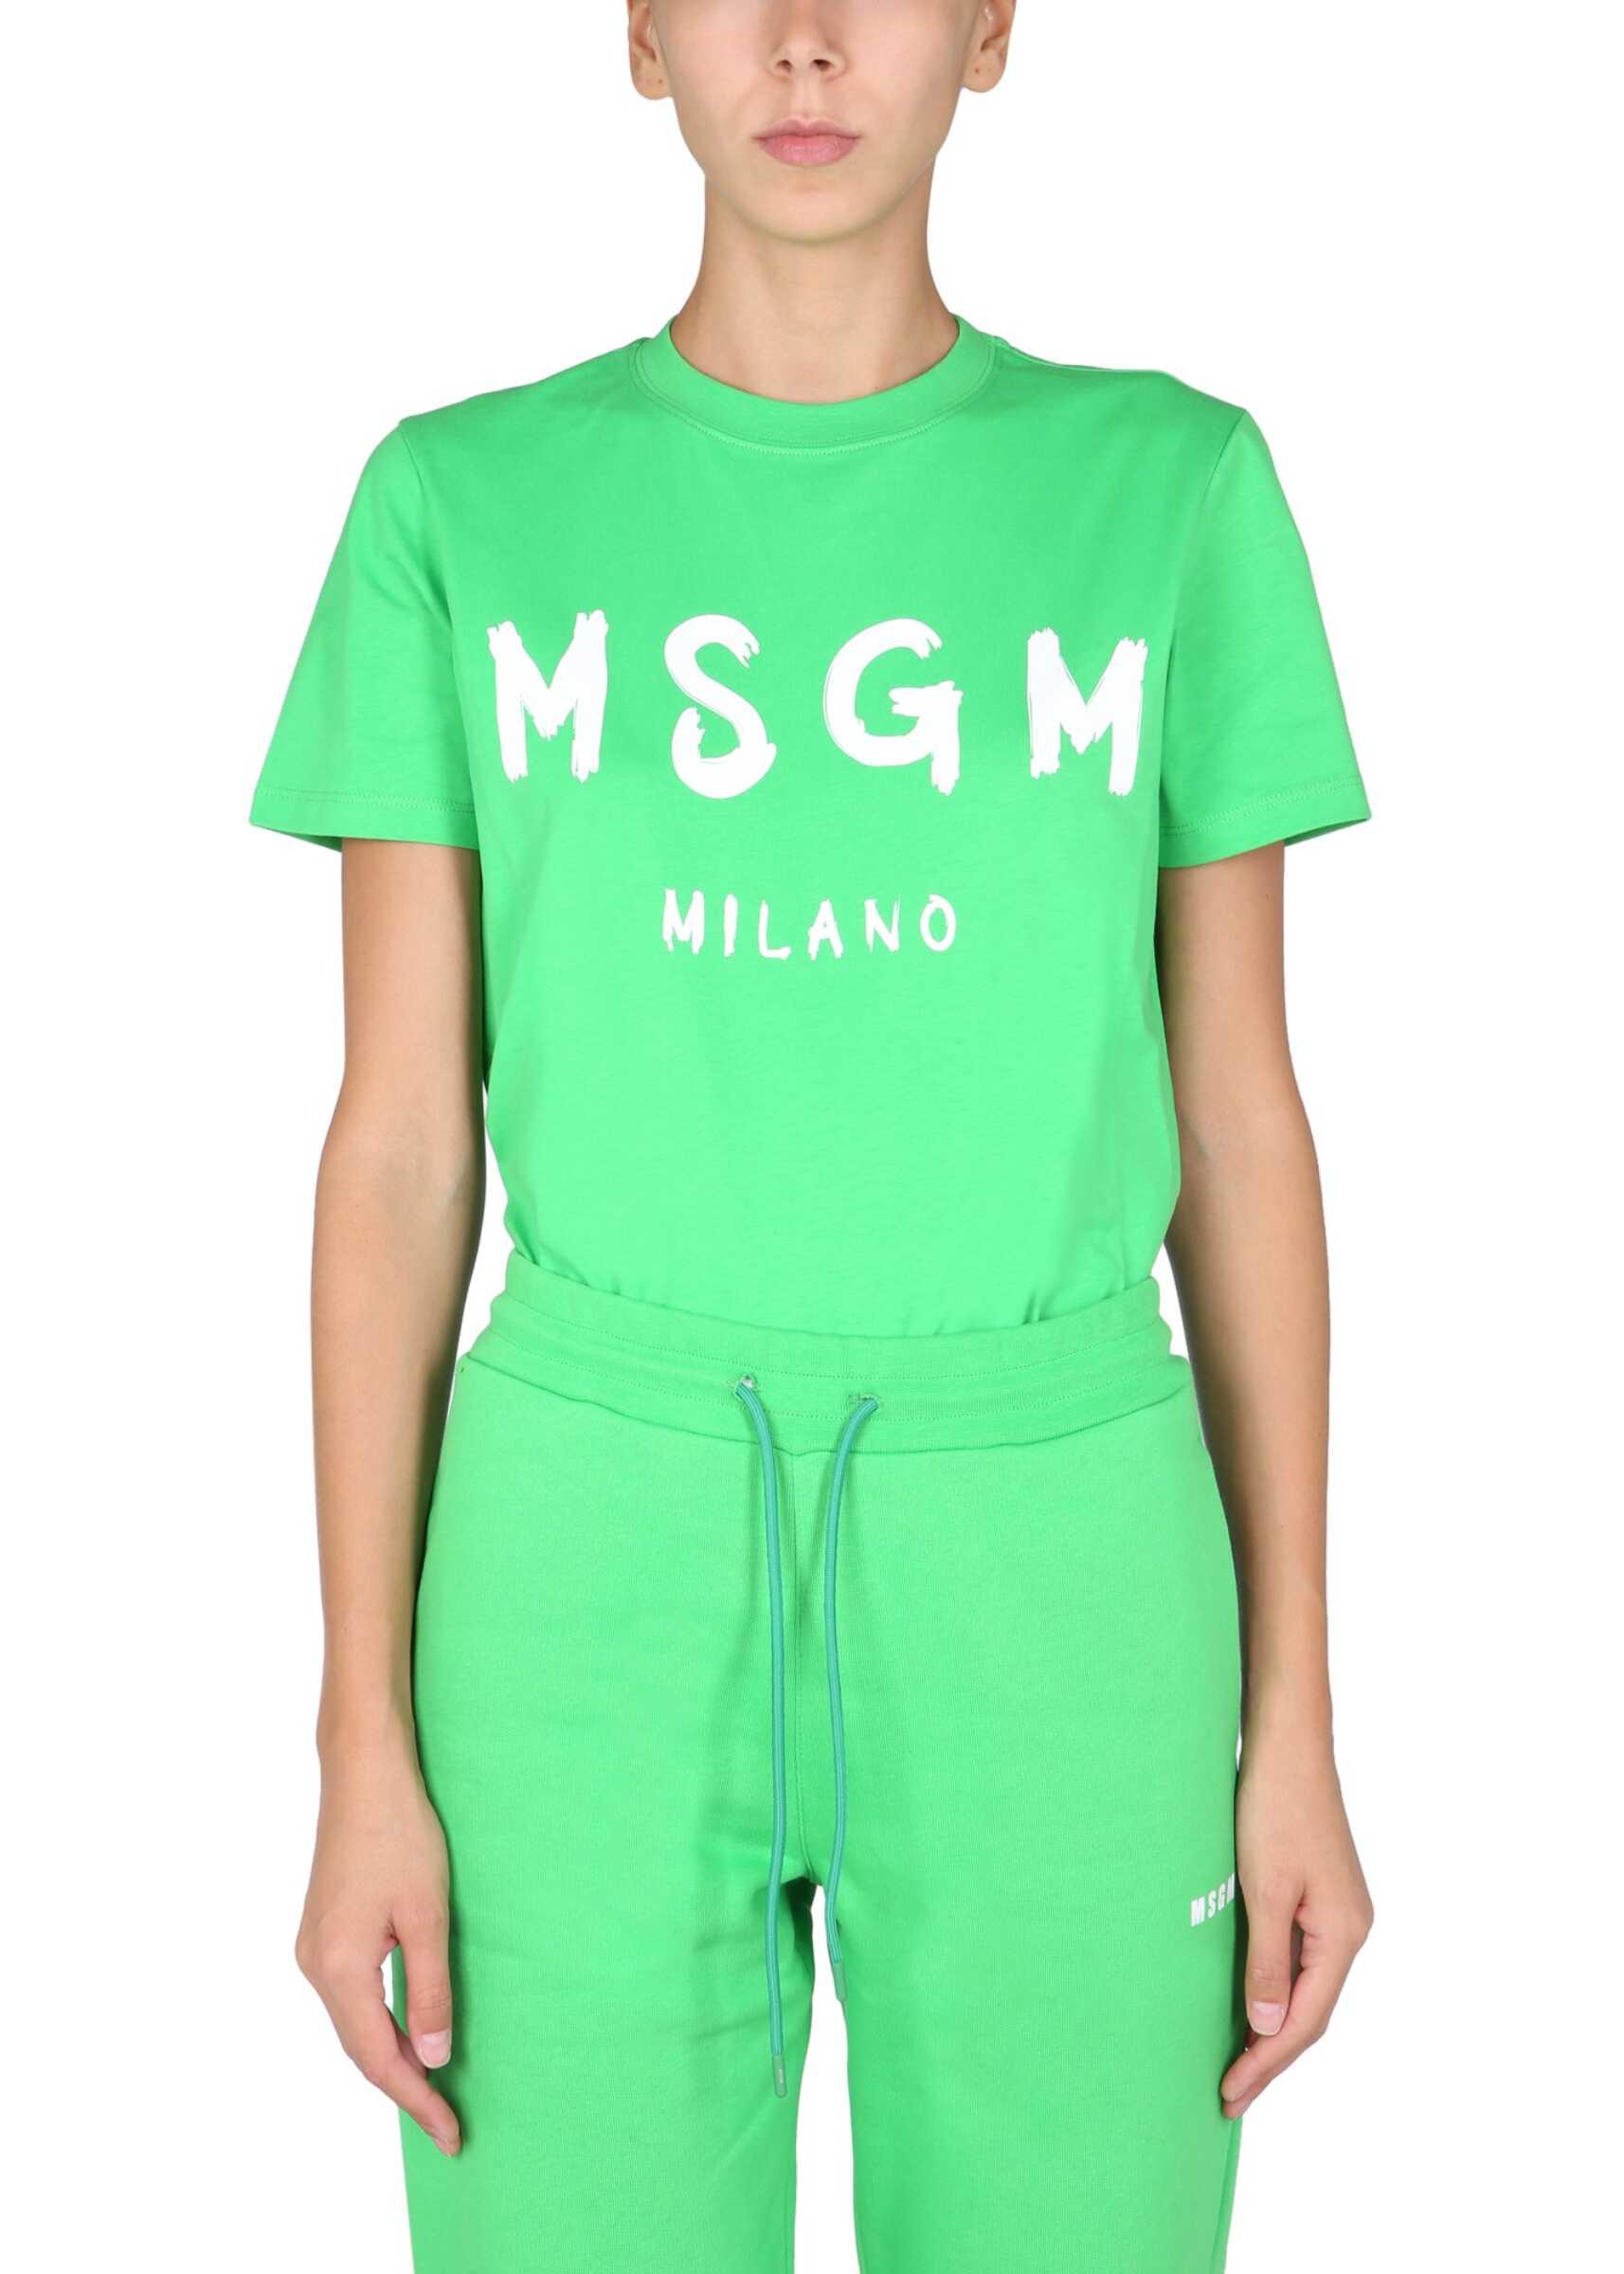 MSGM T-Shirt With Brushed Logo 3142MDM510_21779836 GREEN image0